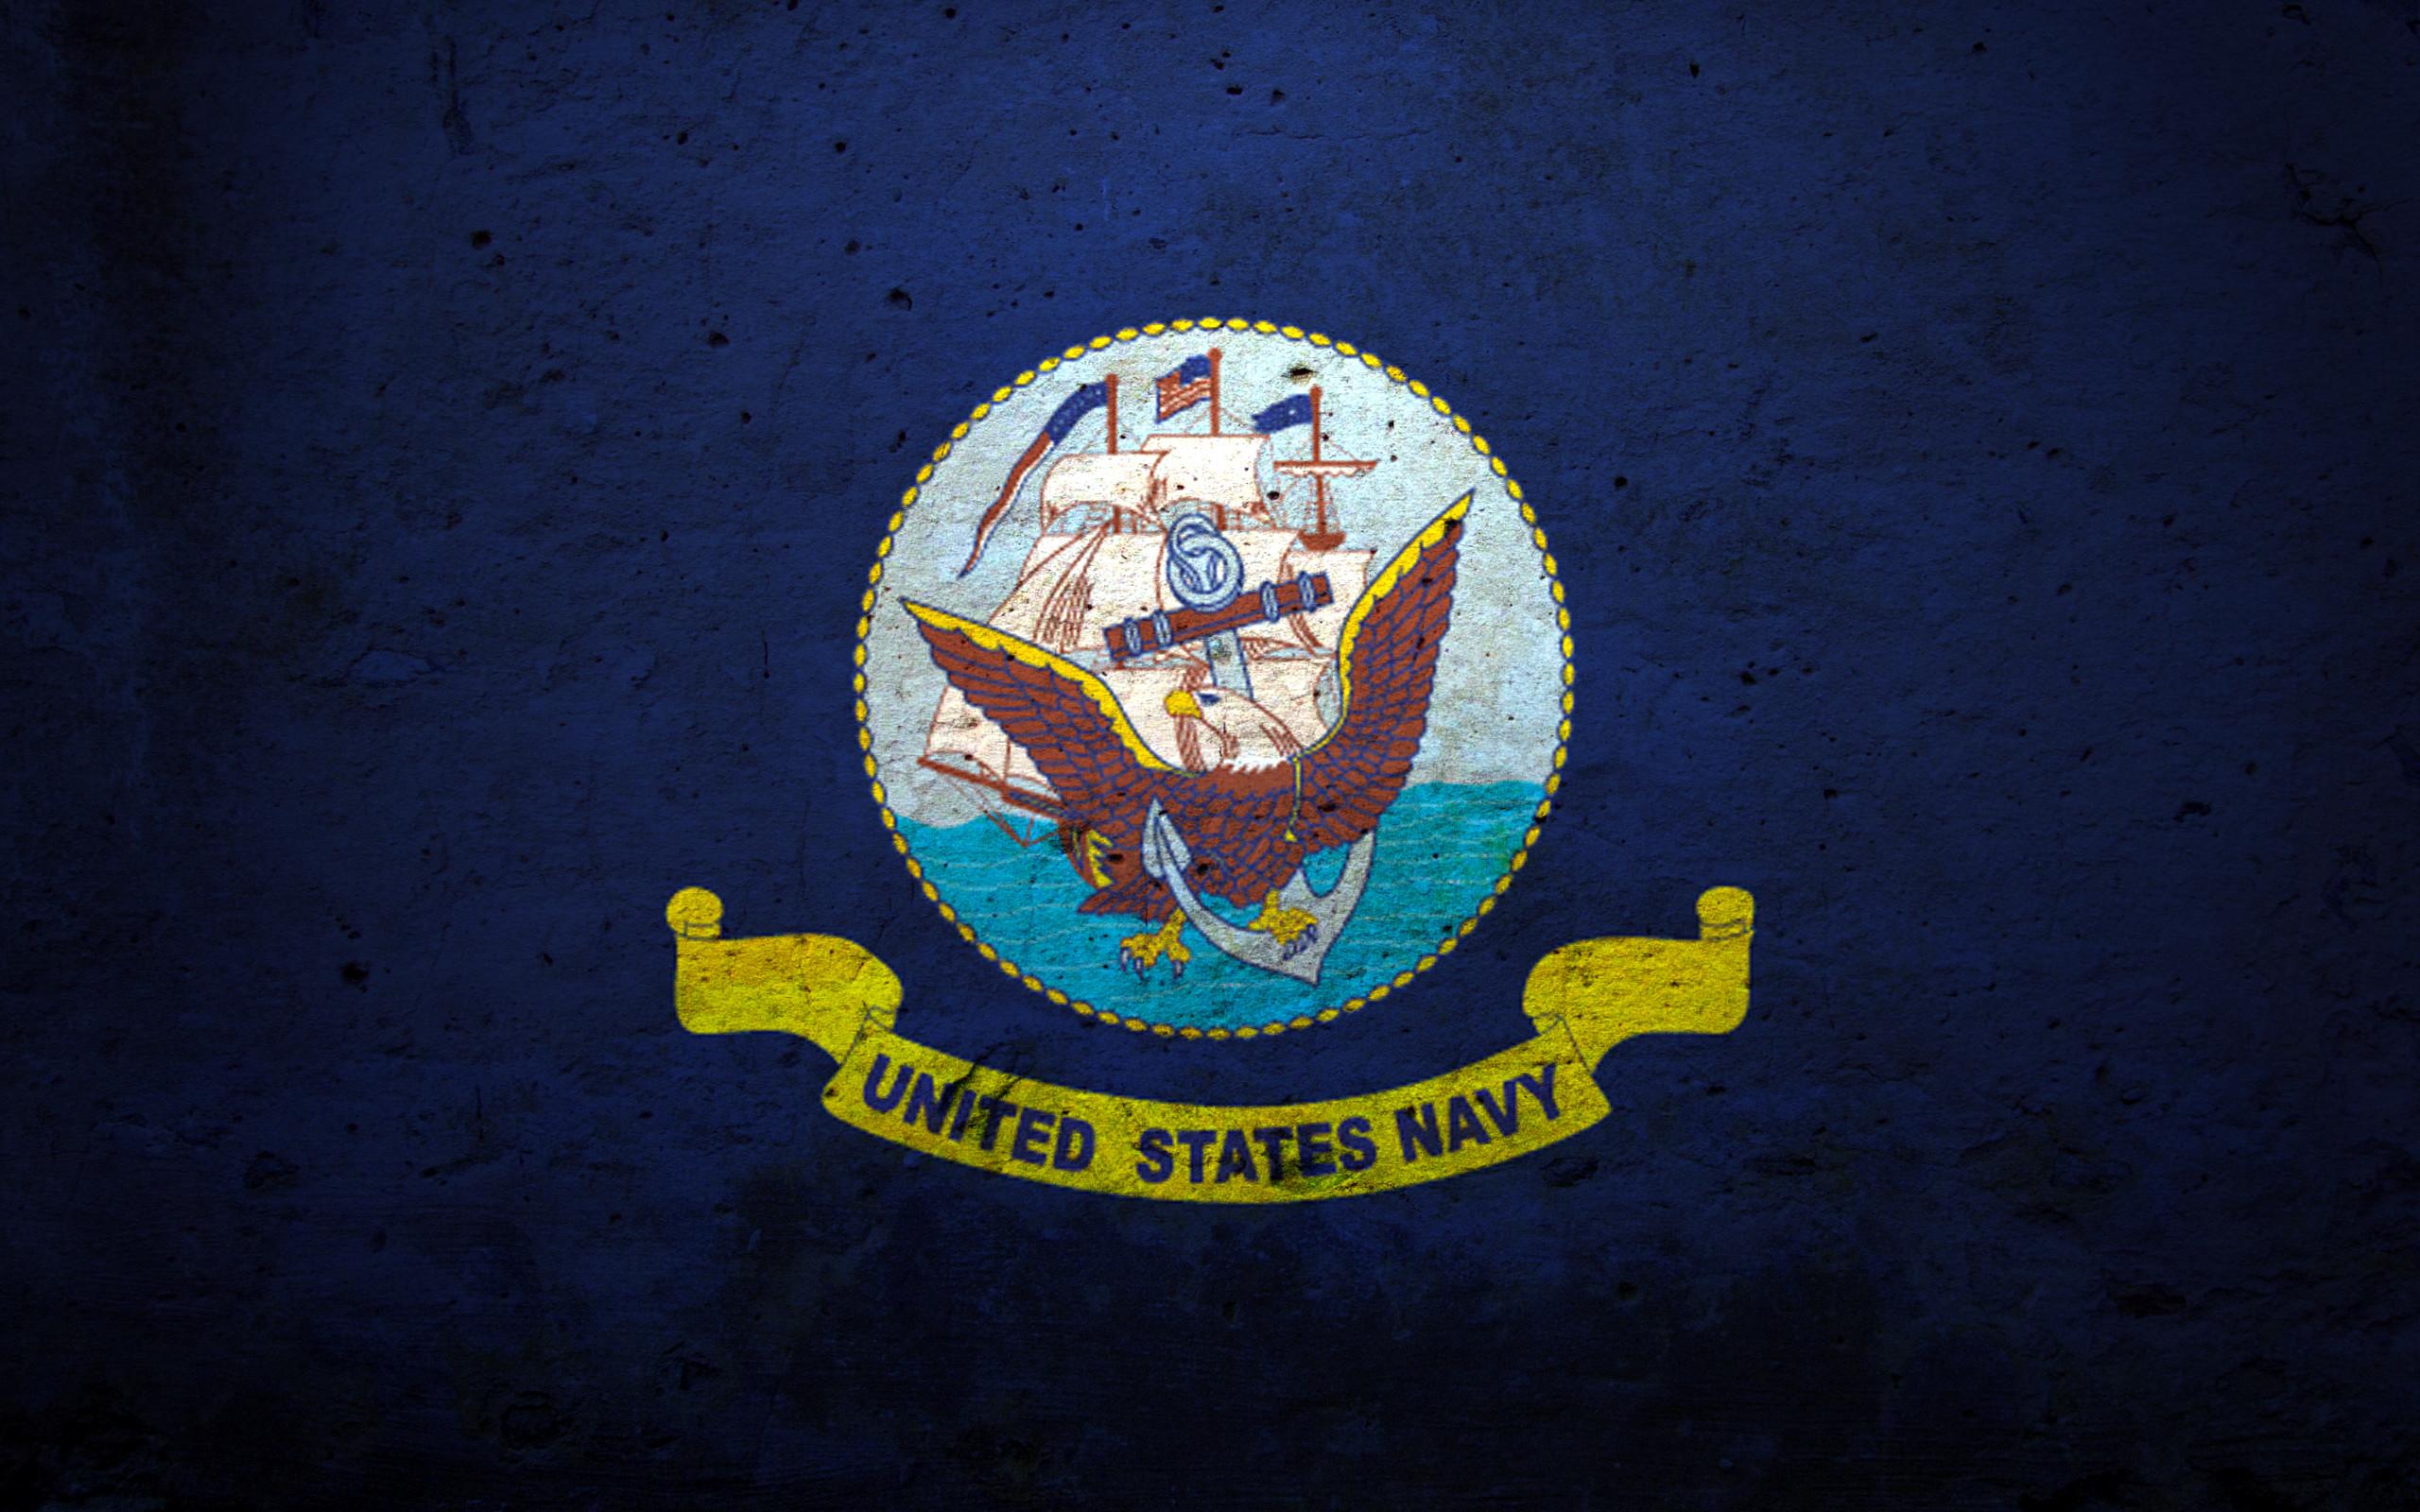 US Navy Images Logo Wallpaper (54+ images)